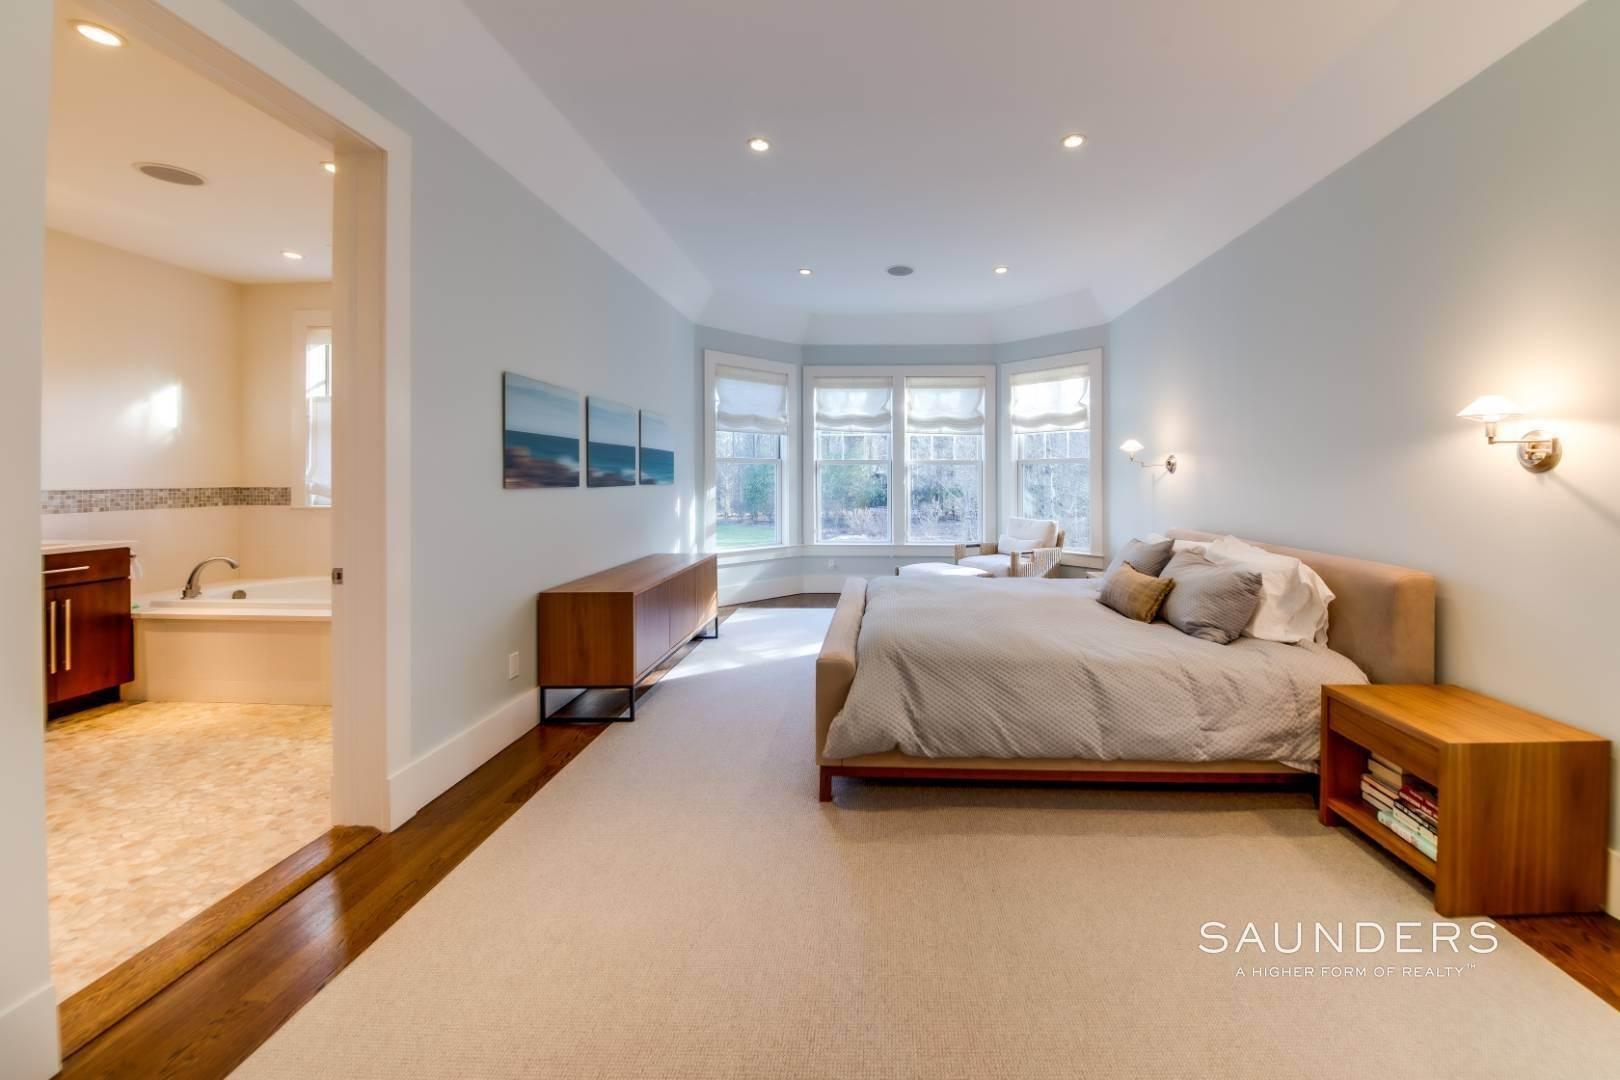 14. Single Family Homes for Sale at Wainscott South Traditional Near Beach Lane 10 Merriwood Drive, Wainscott, East Hampton Town, NY 11975